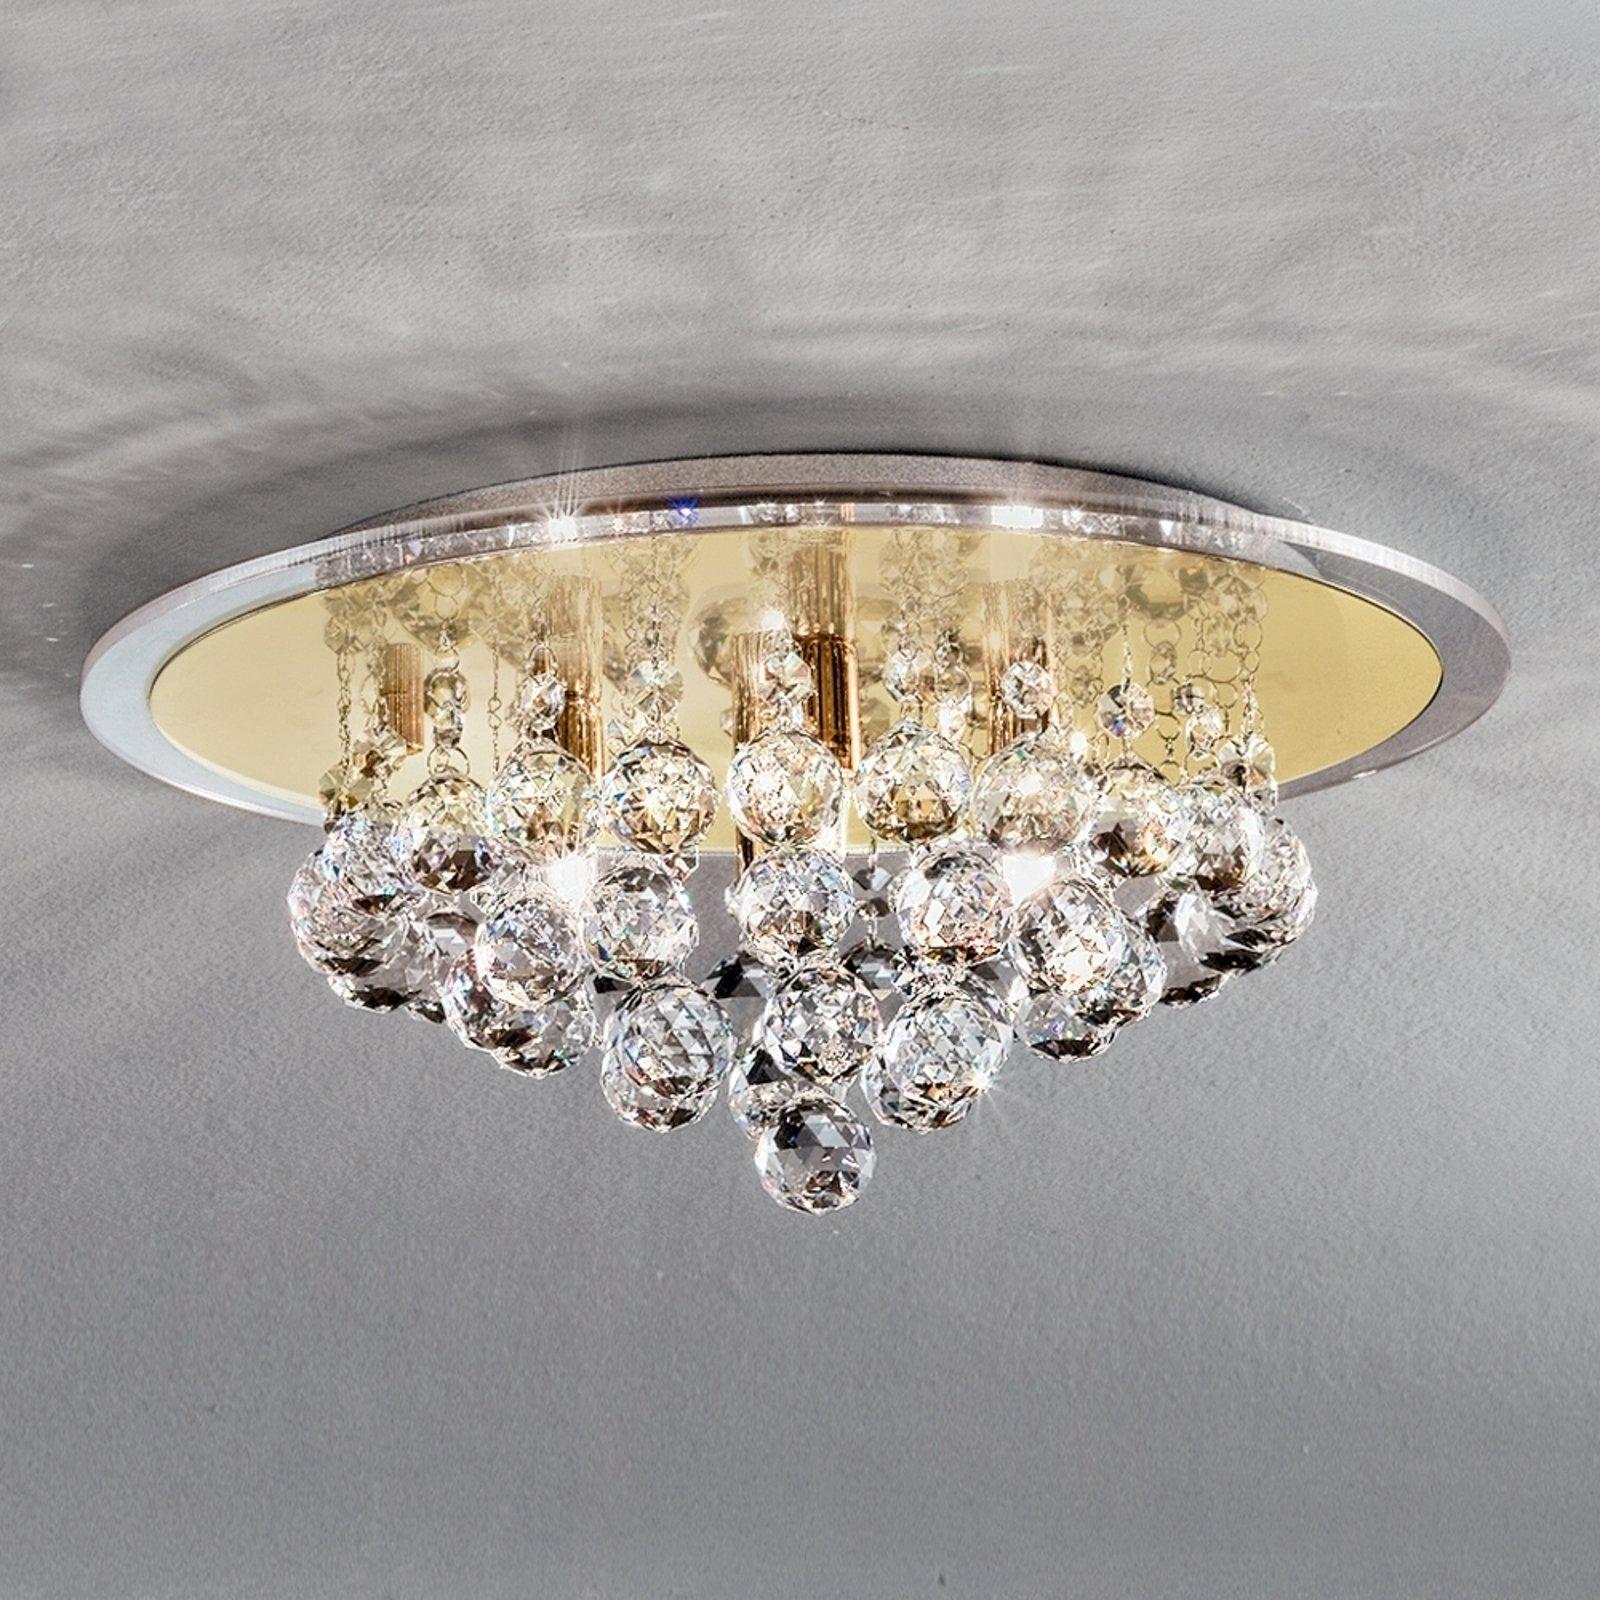 Uttrykksfull TUILA krystall taklampe 38 cm